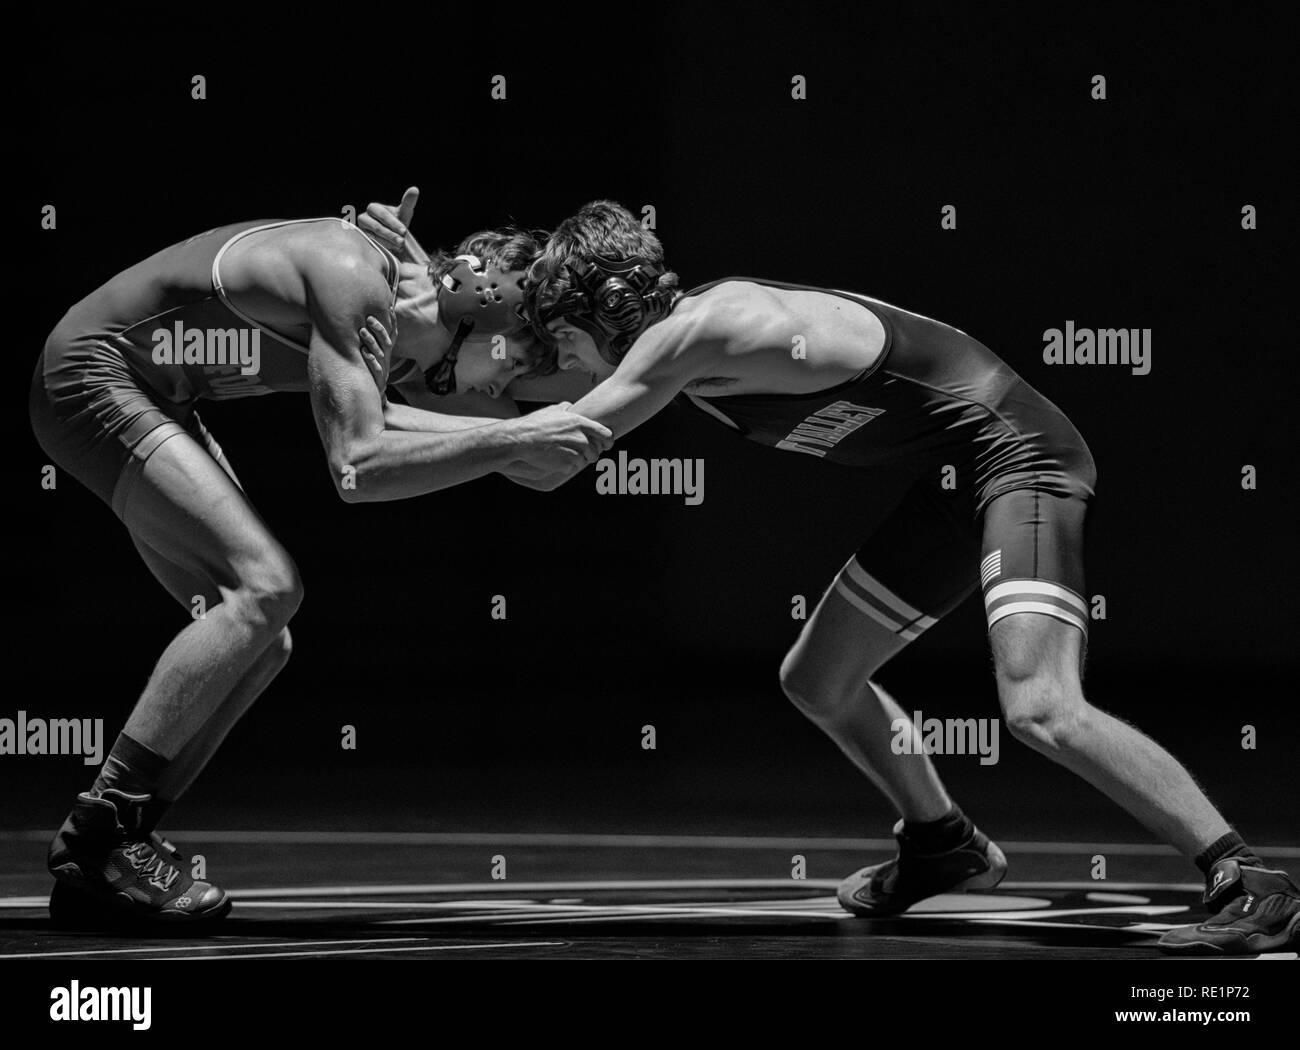 Wrestler Black and White Stock Photos & Images - Alamy